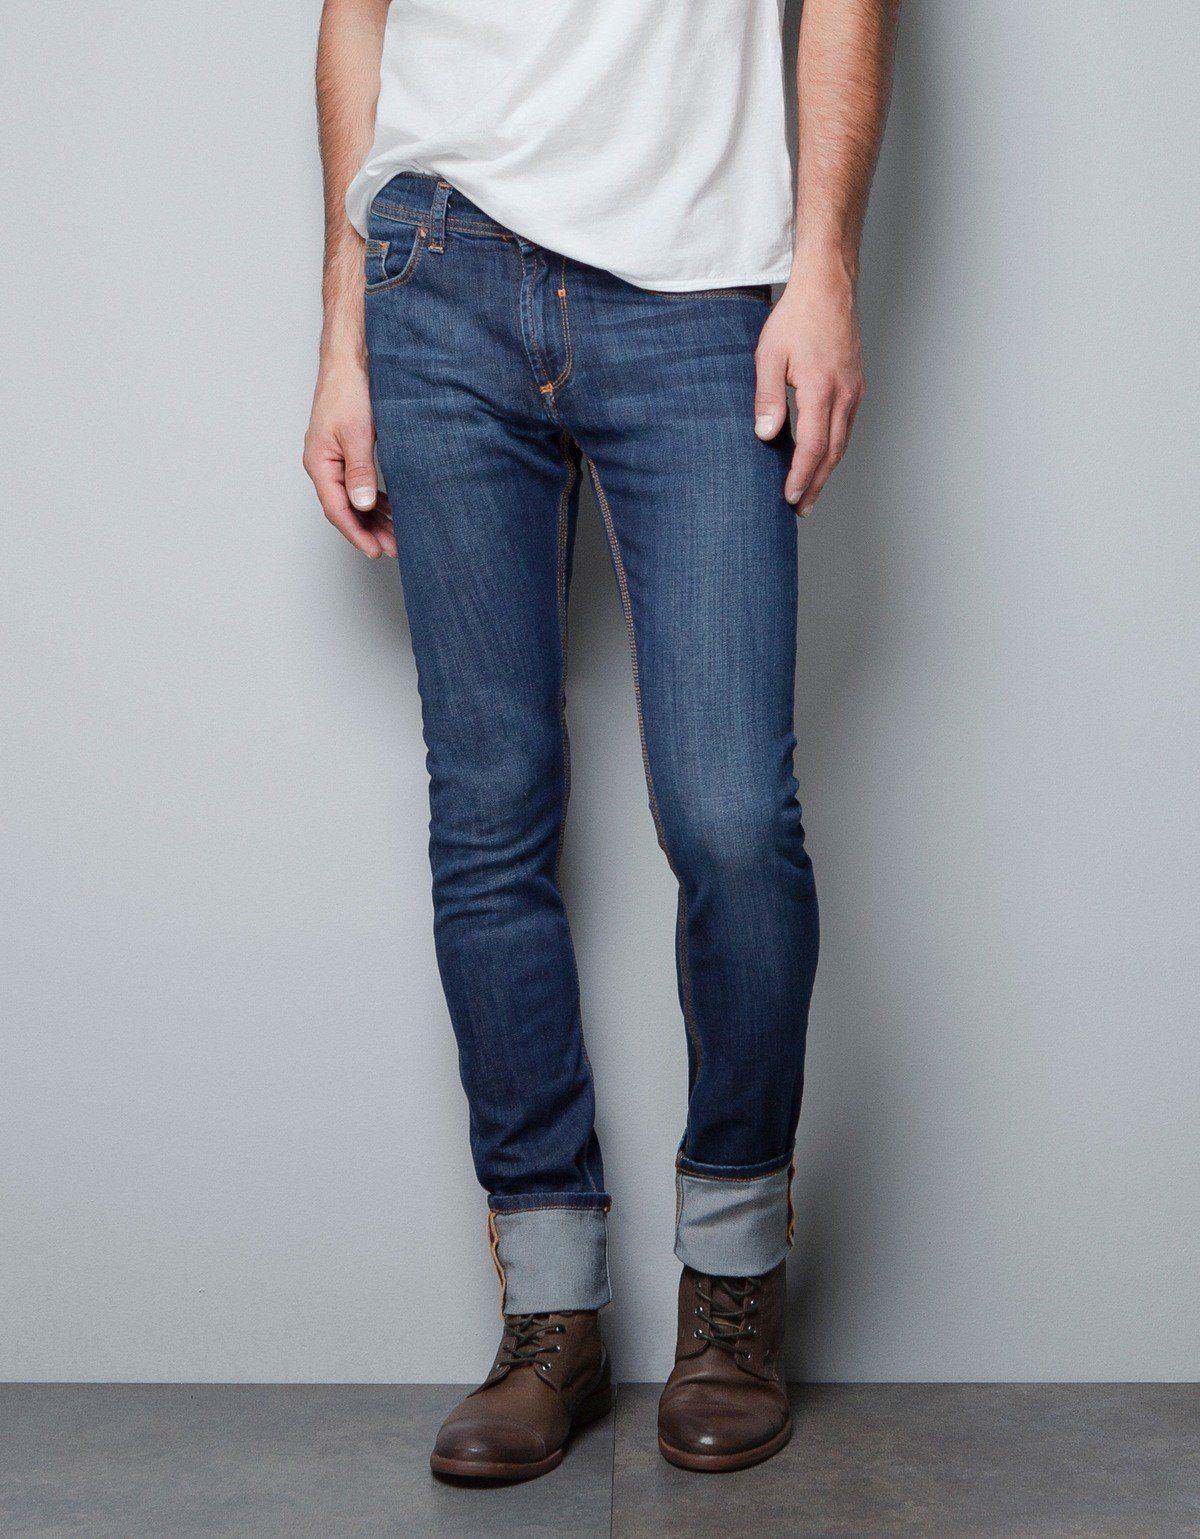 jeans-skinny-tachuelas-rebajas-zara-2013